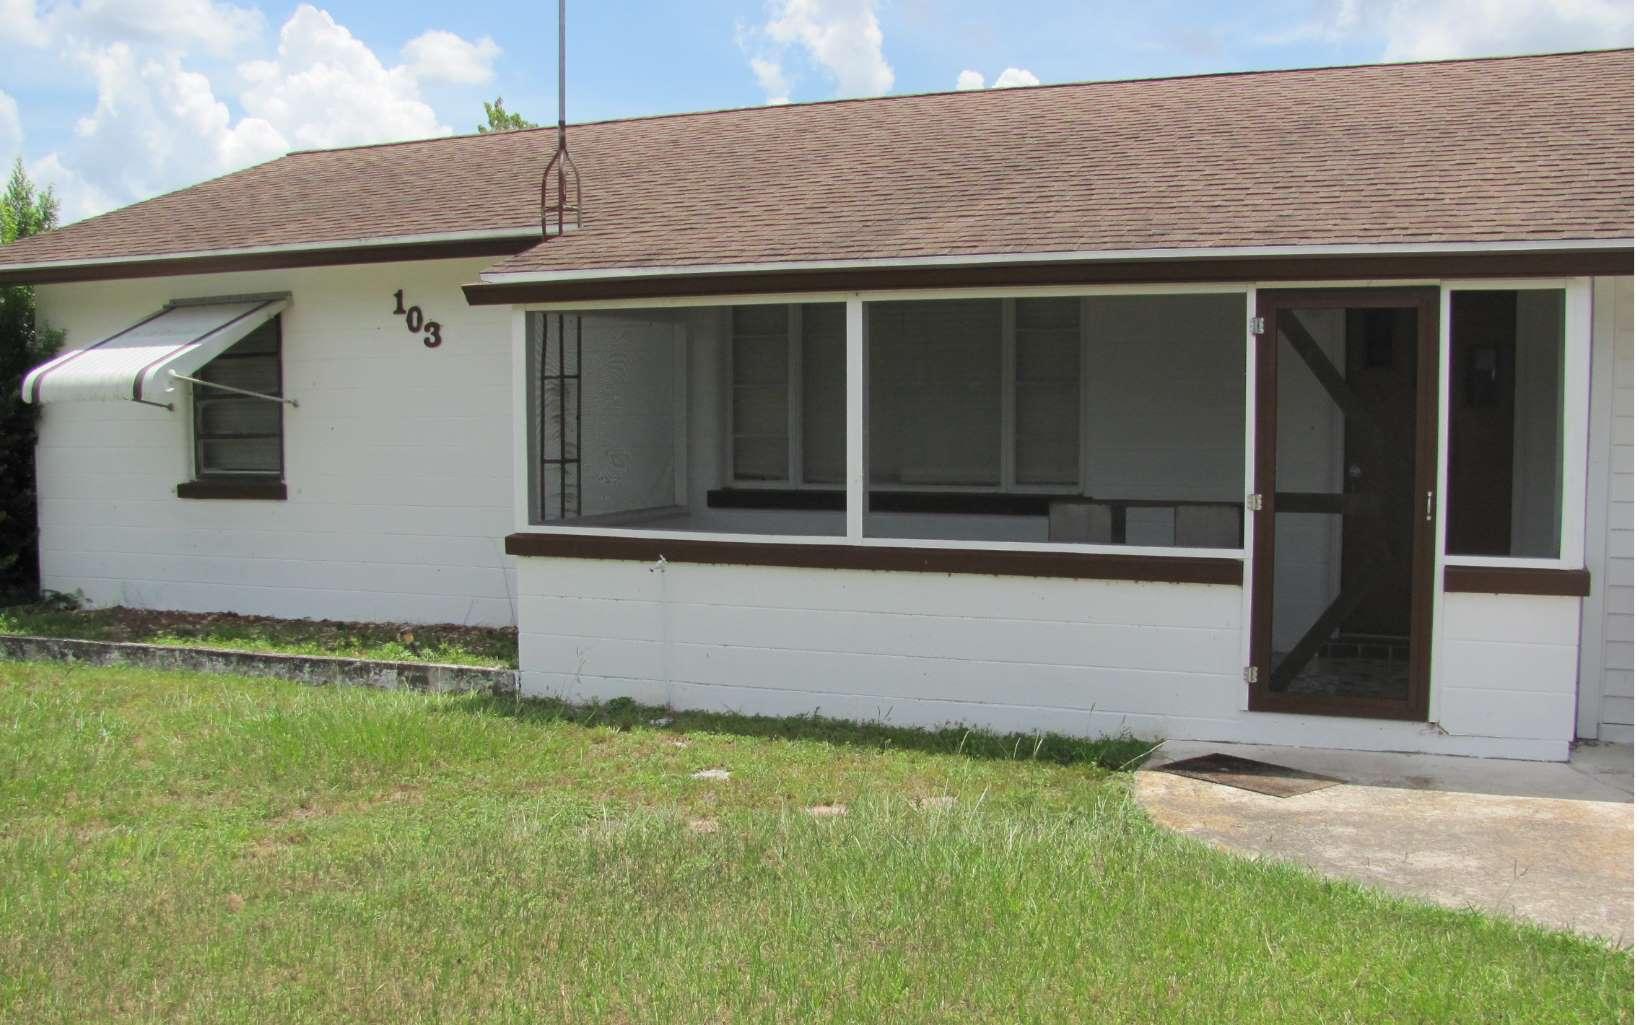 103 W Pleasant St, Avon Park, FL 33825